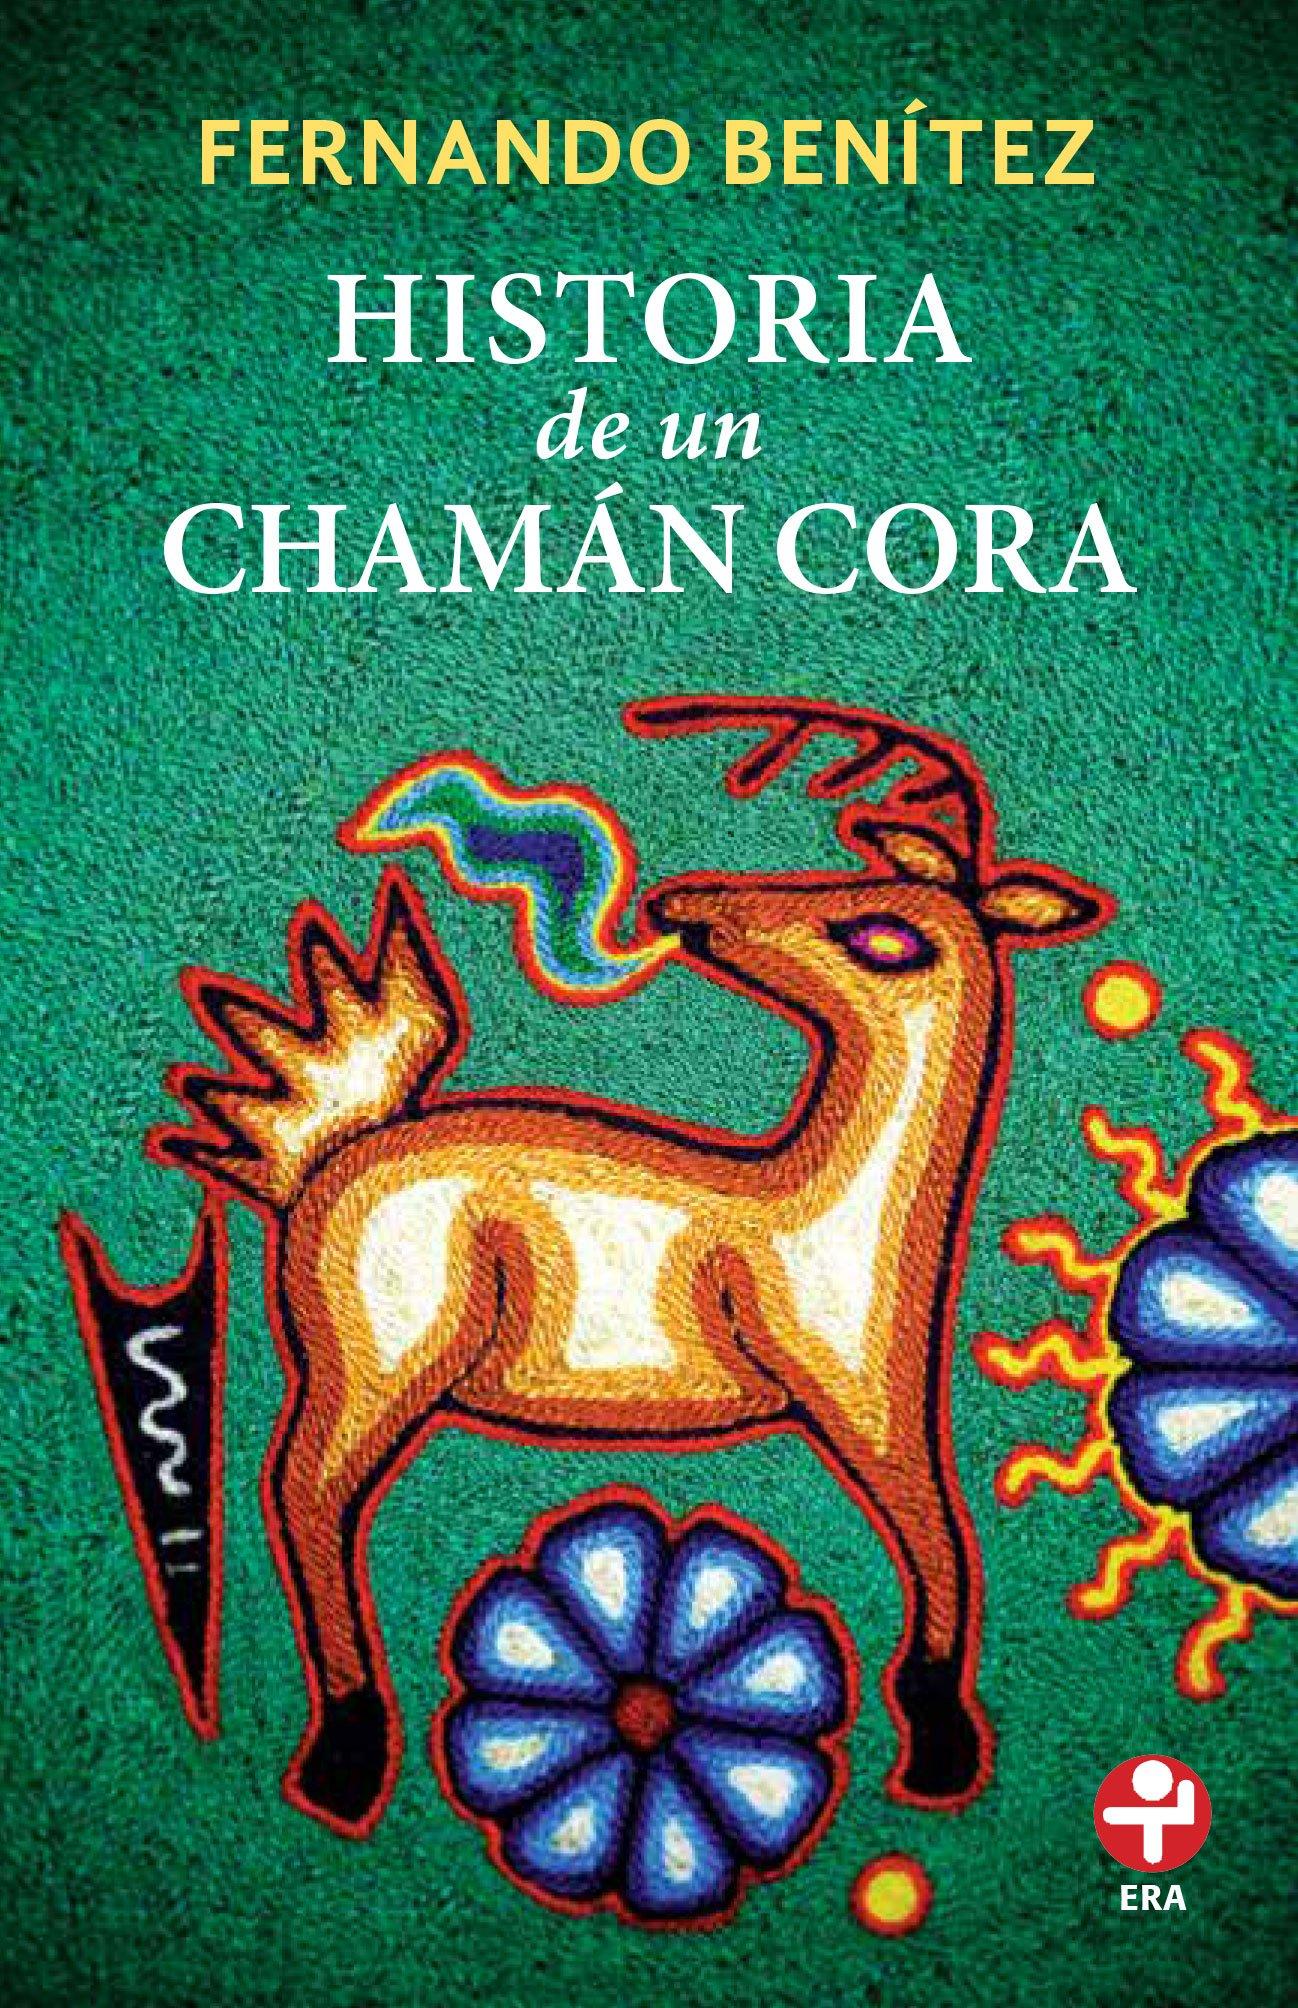 Download Historia de un chamán cora (Spanish Edition) PDF